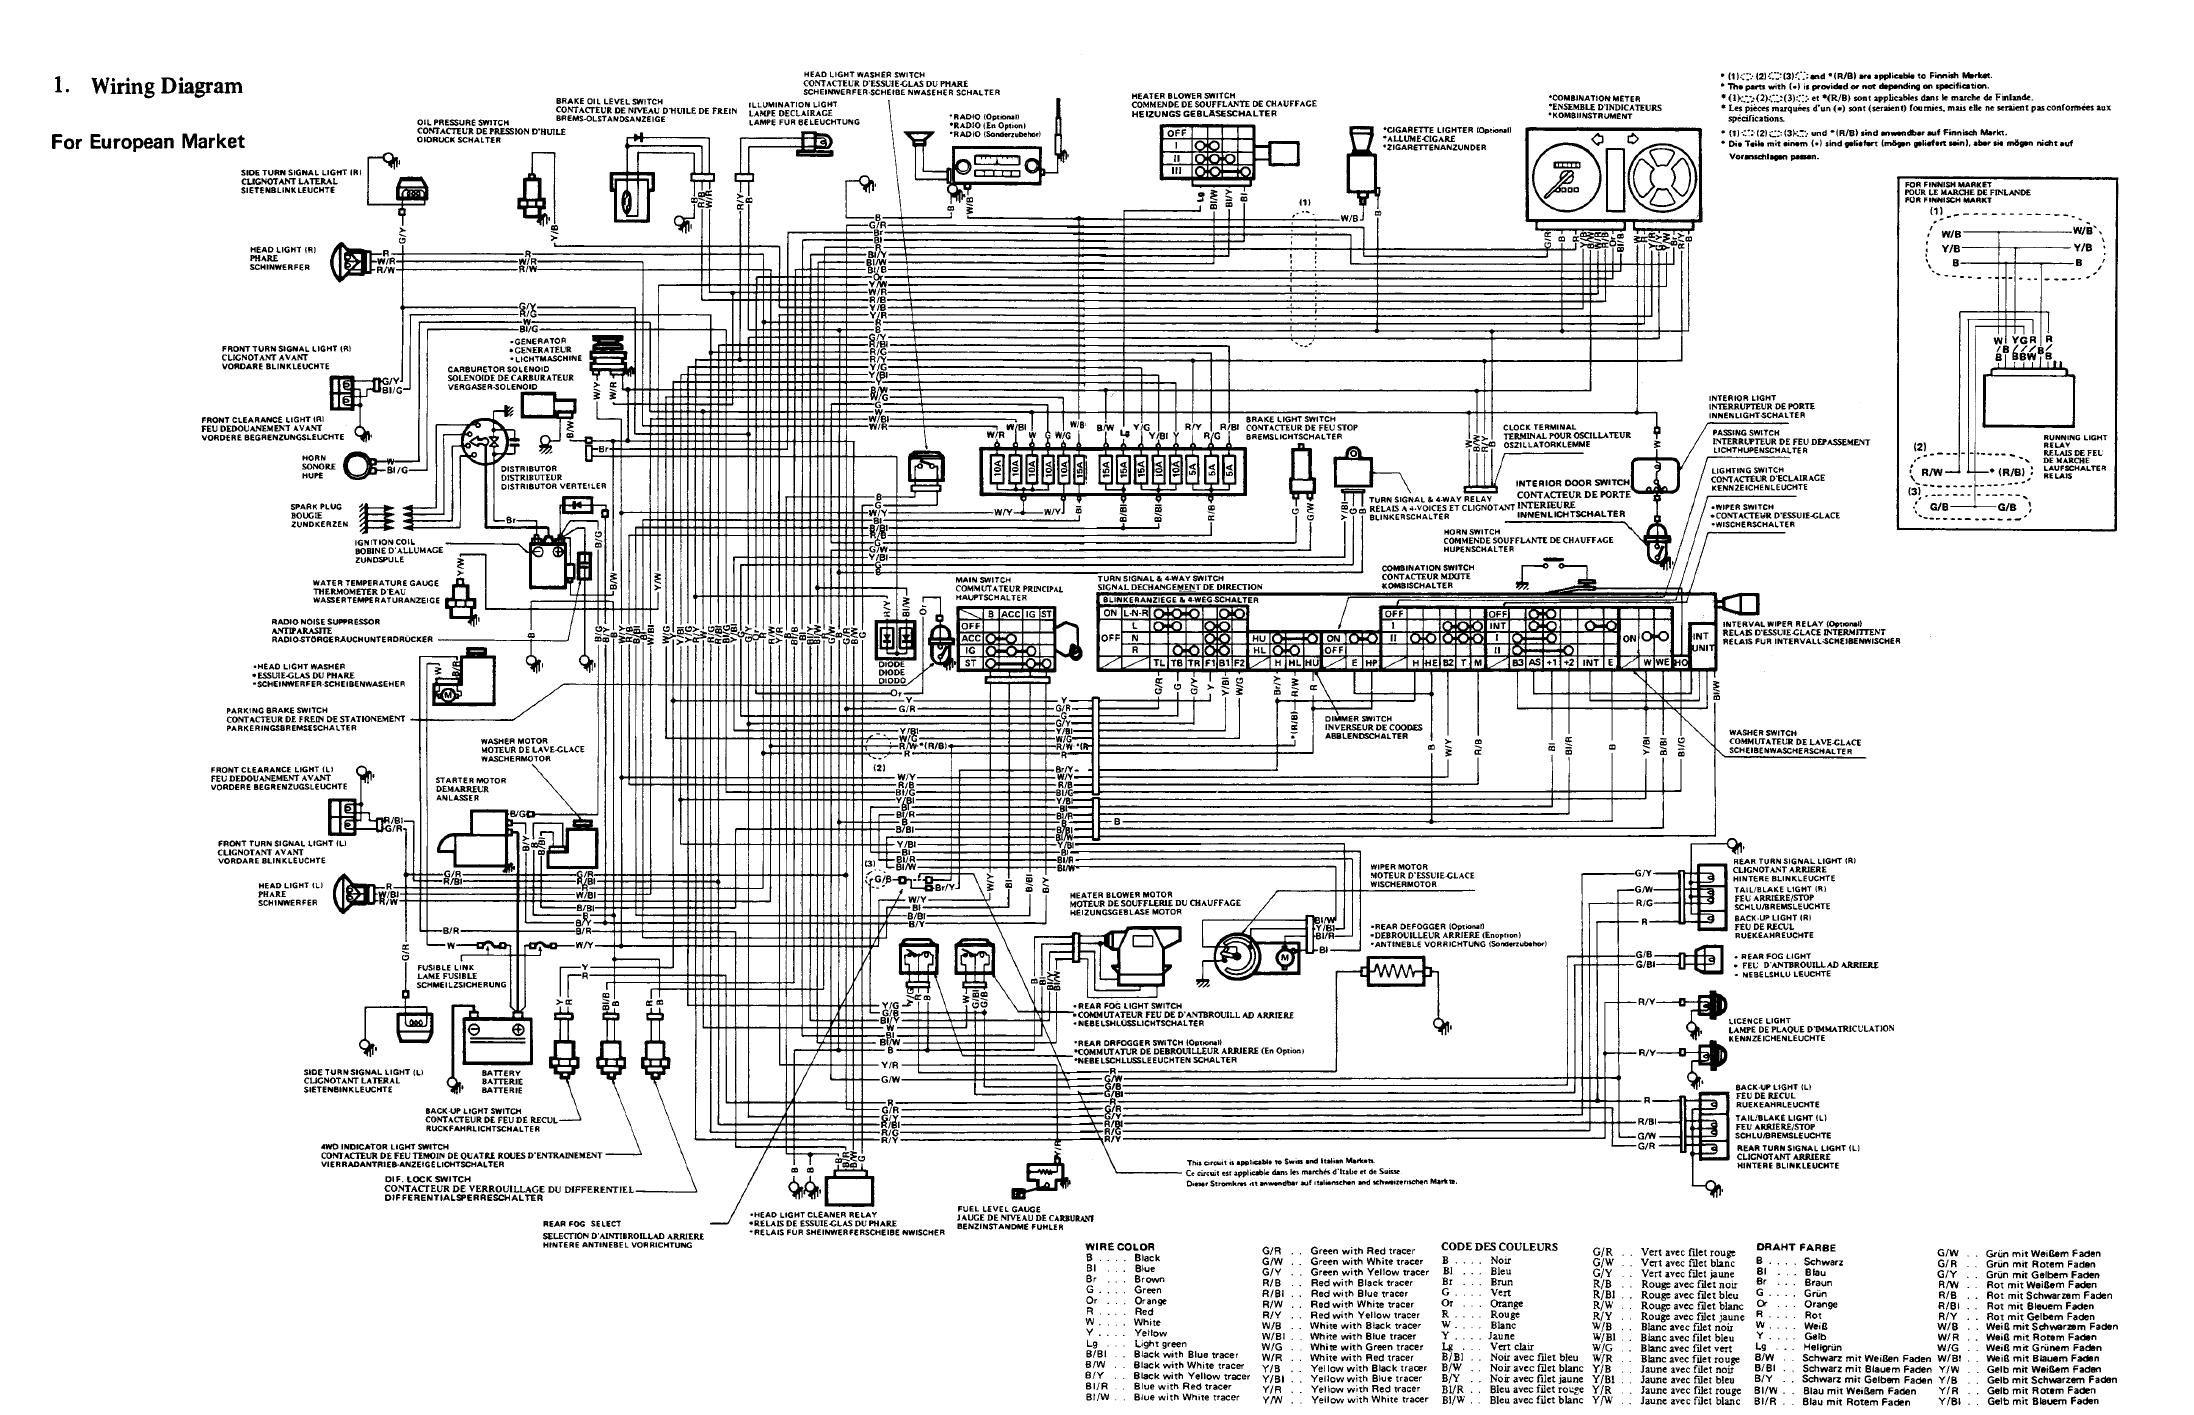 diagram] suzuki every wagon user wiring diagram full version hd quality -  outletdiagram.visitmanfredonia.it  outletdiagram.visitmanfredonia.it